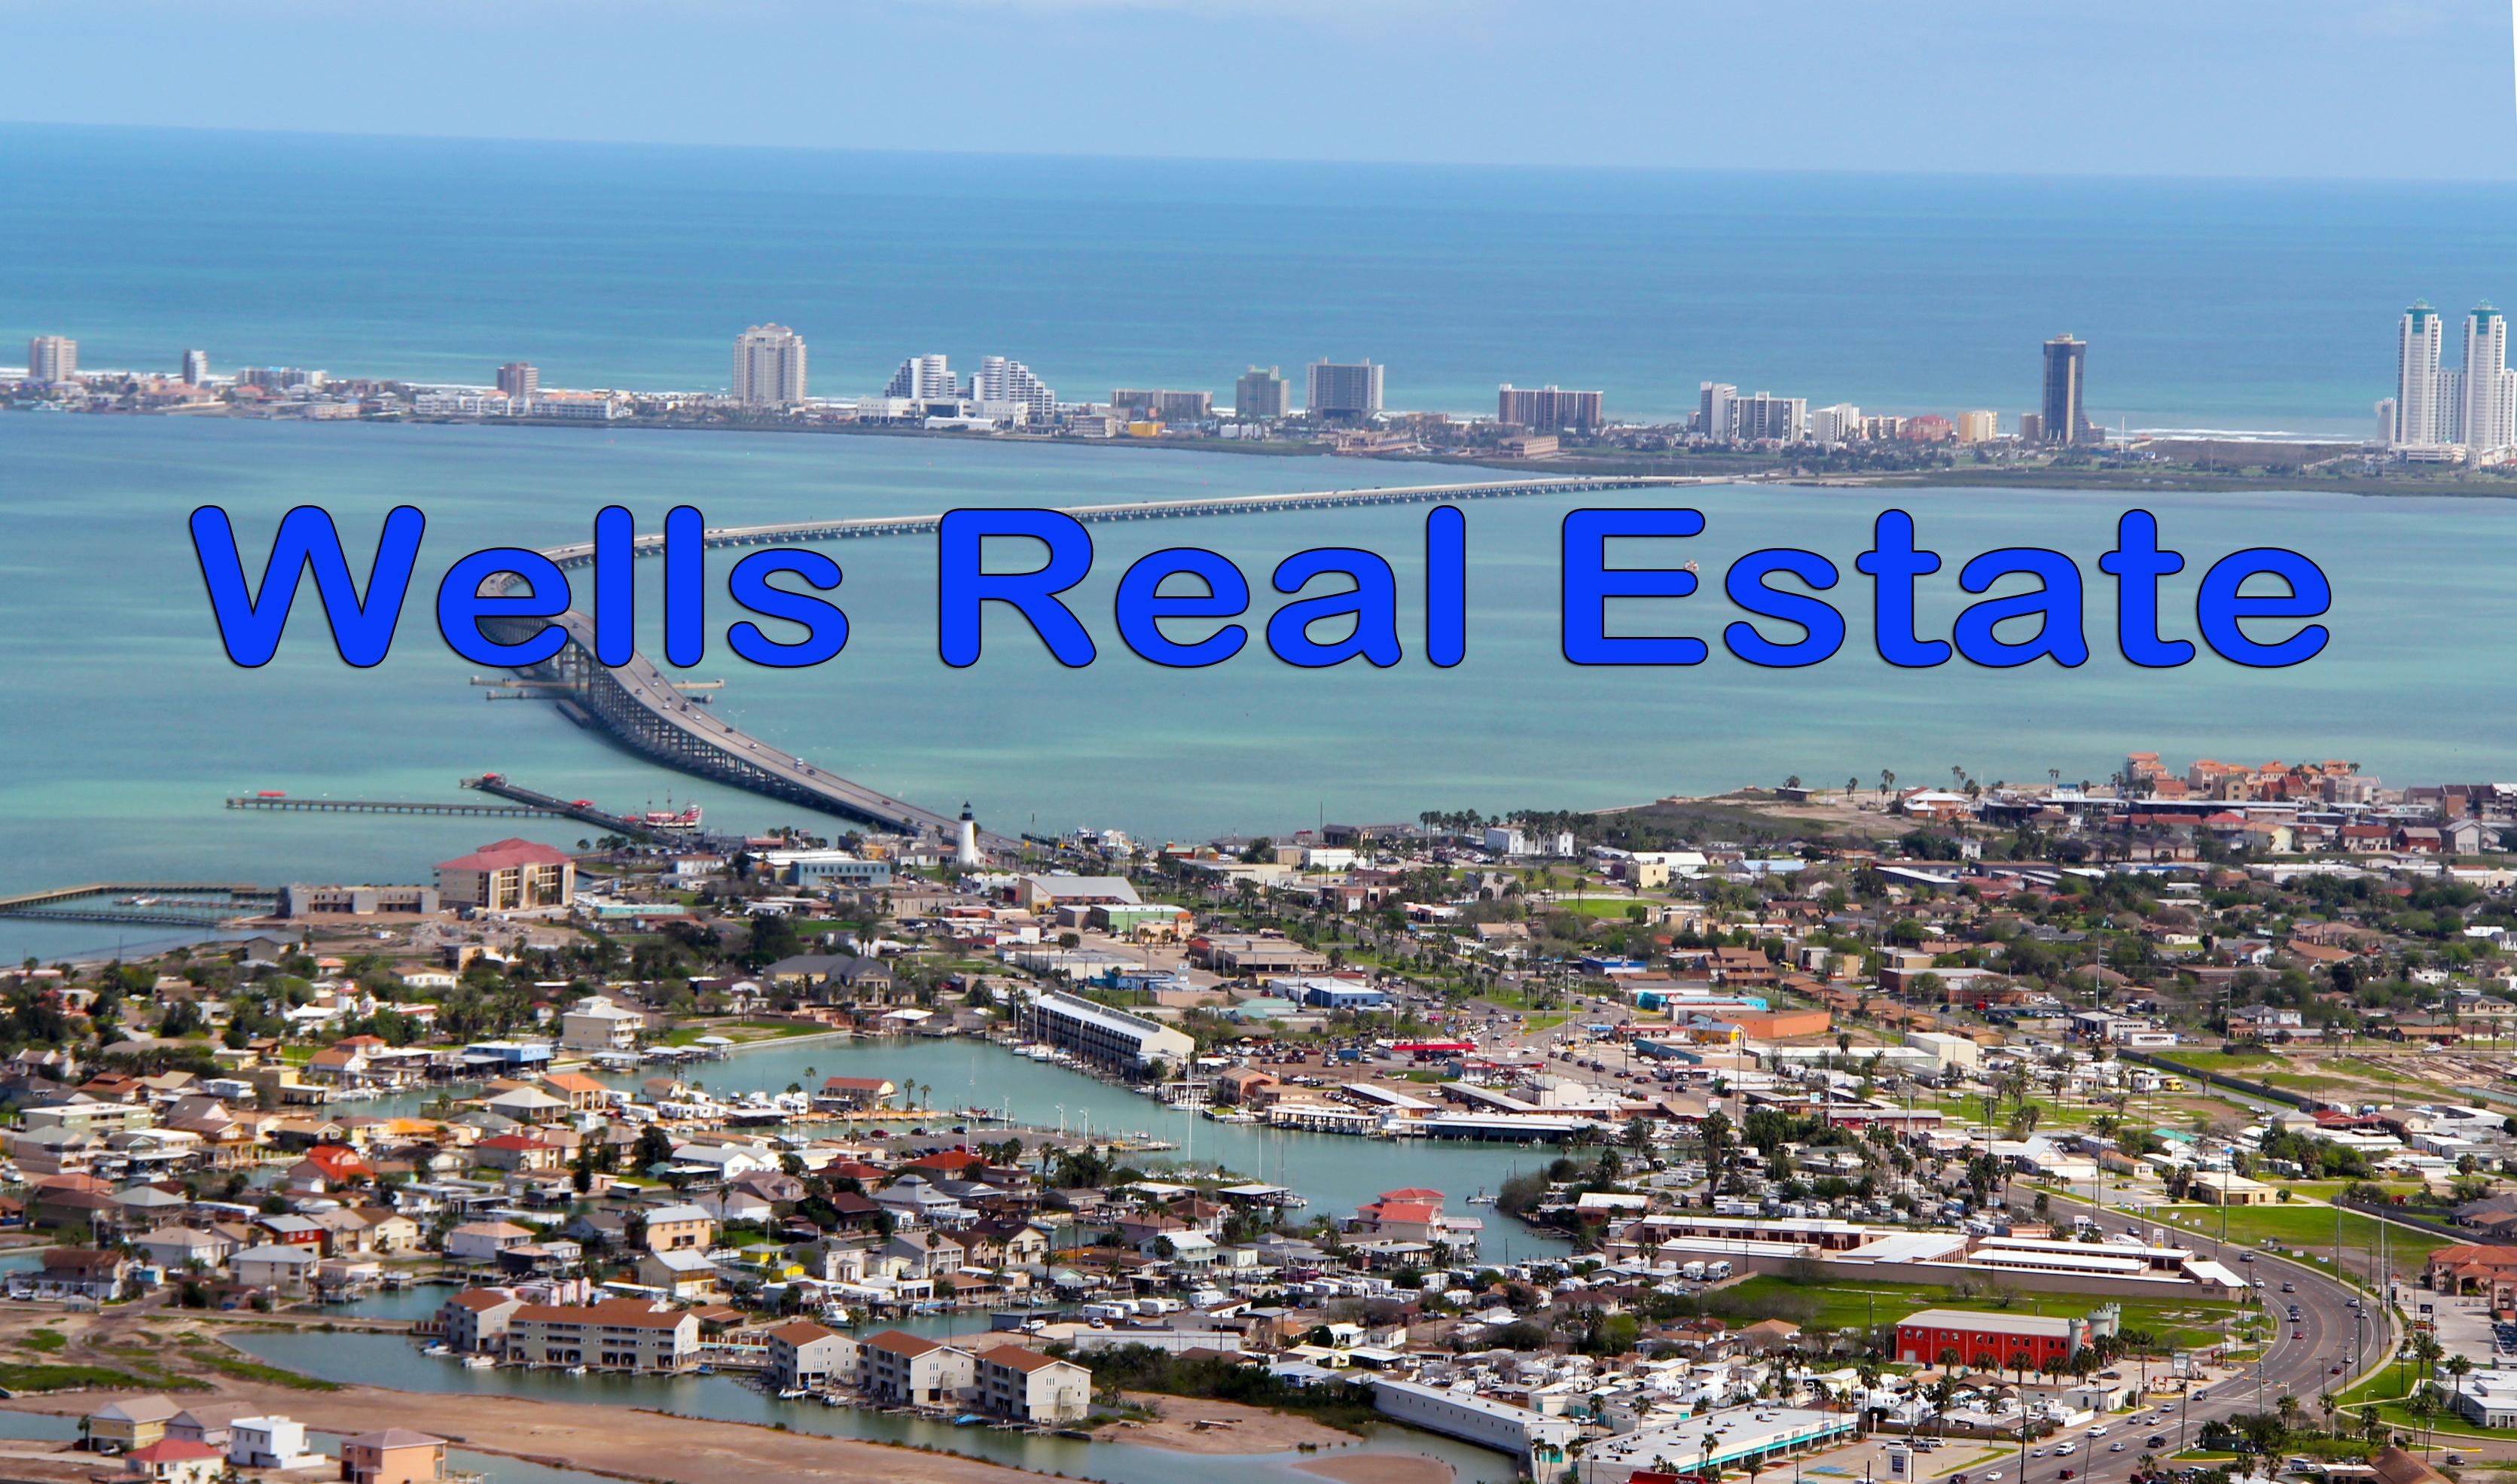 Wells Real Estate